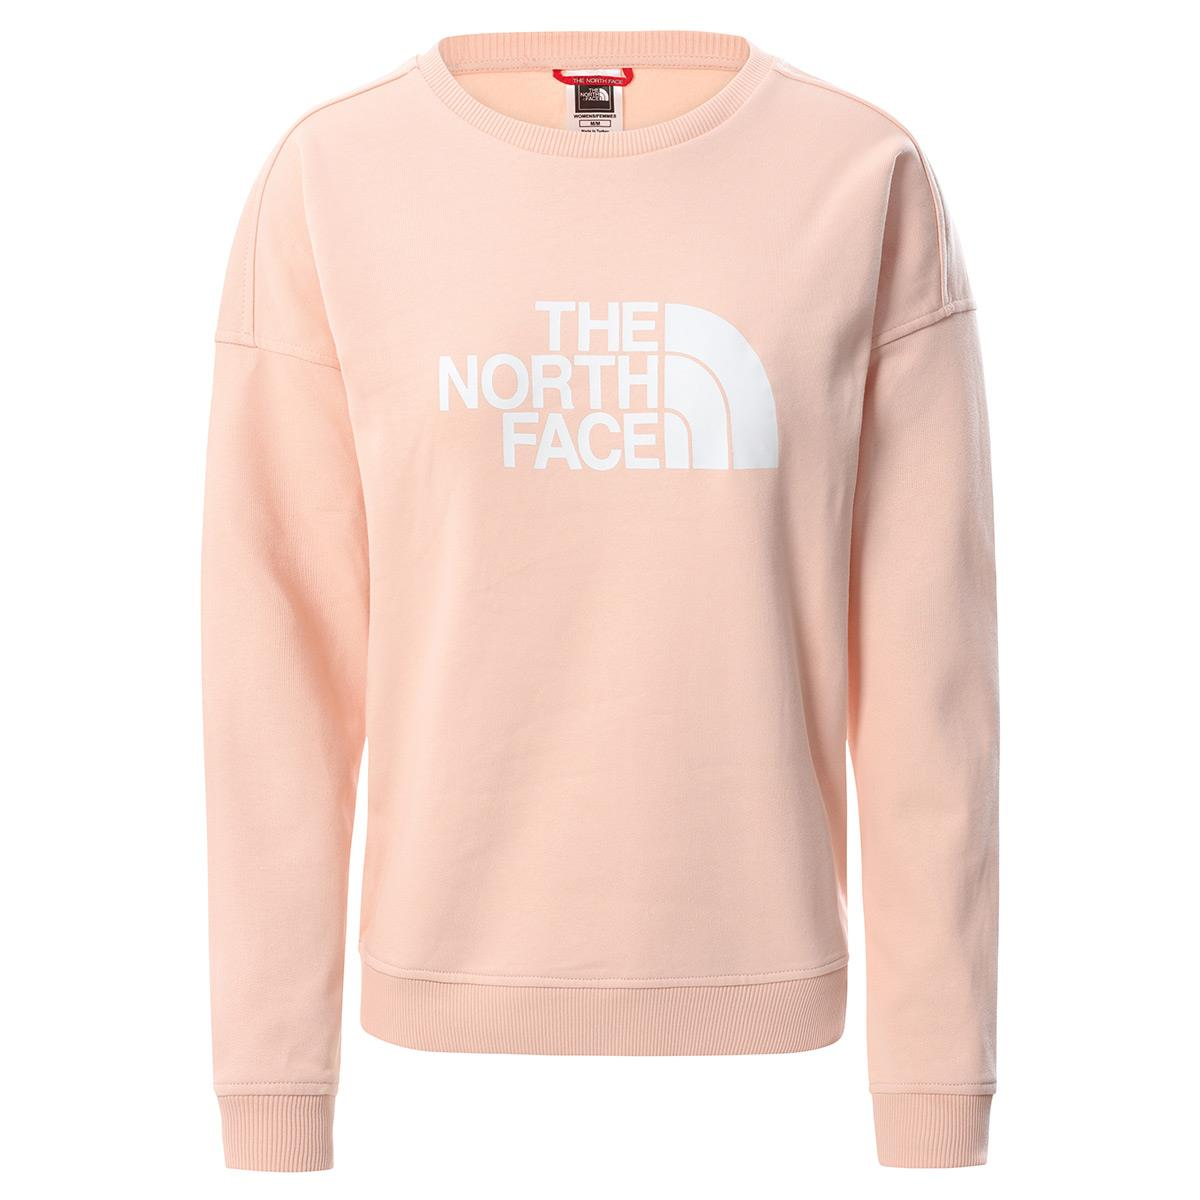 The North Face  Kadın DREW PEAK CREW   Sweat Shirt